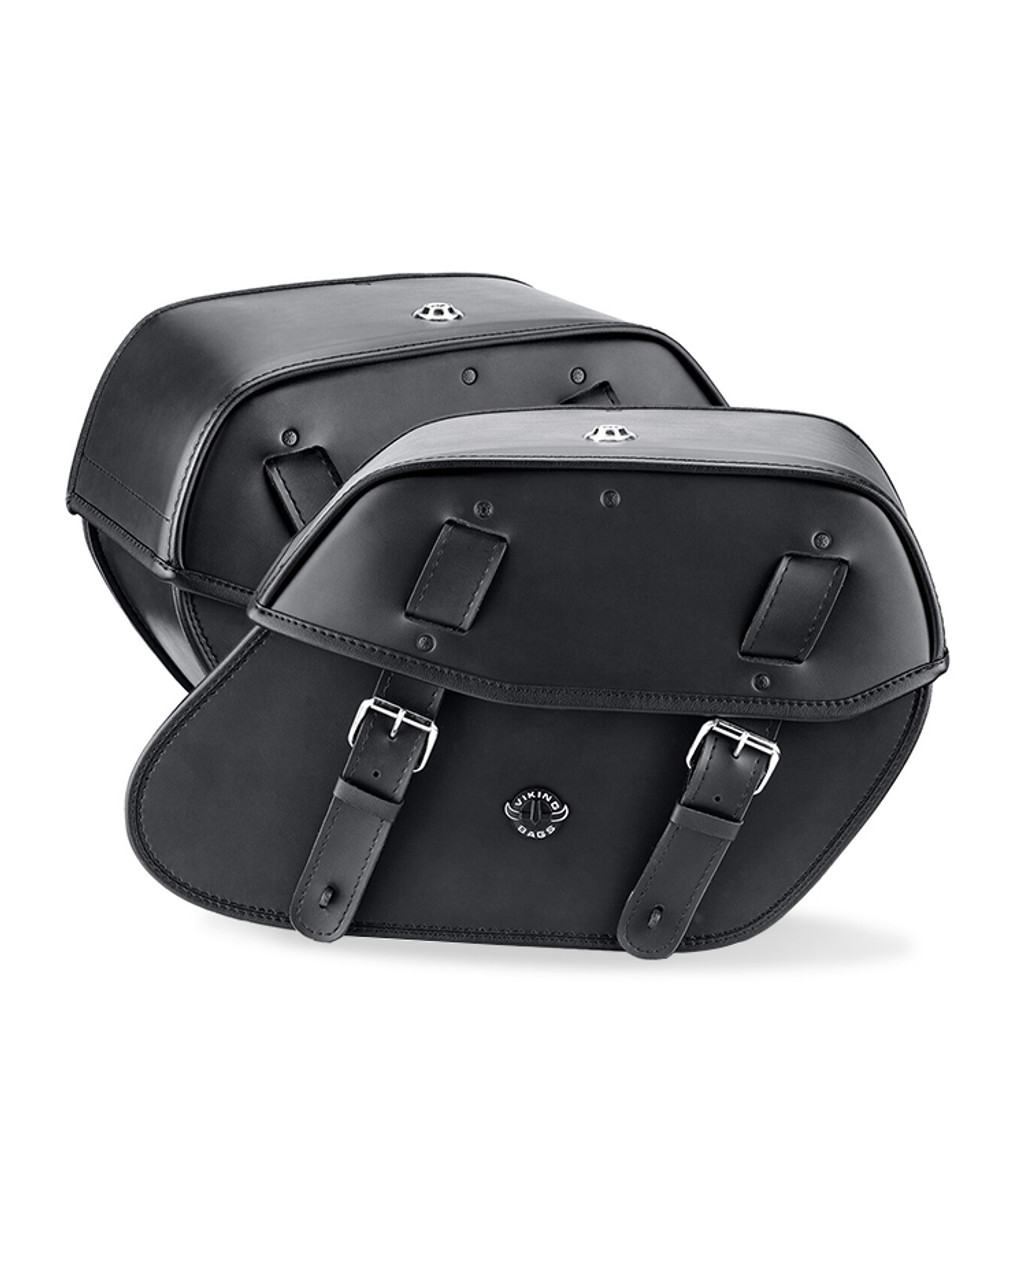 Honda 1500 Valkyrie Standard  Viking Odin Medium Motorcycle Saddlebags Both Bags View